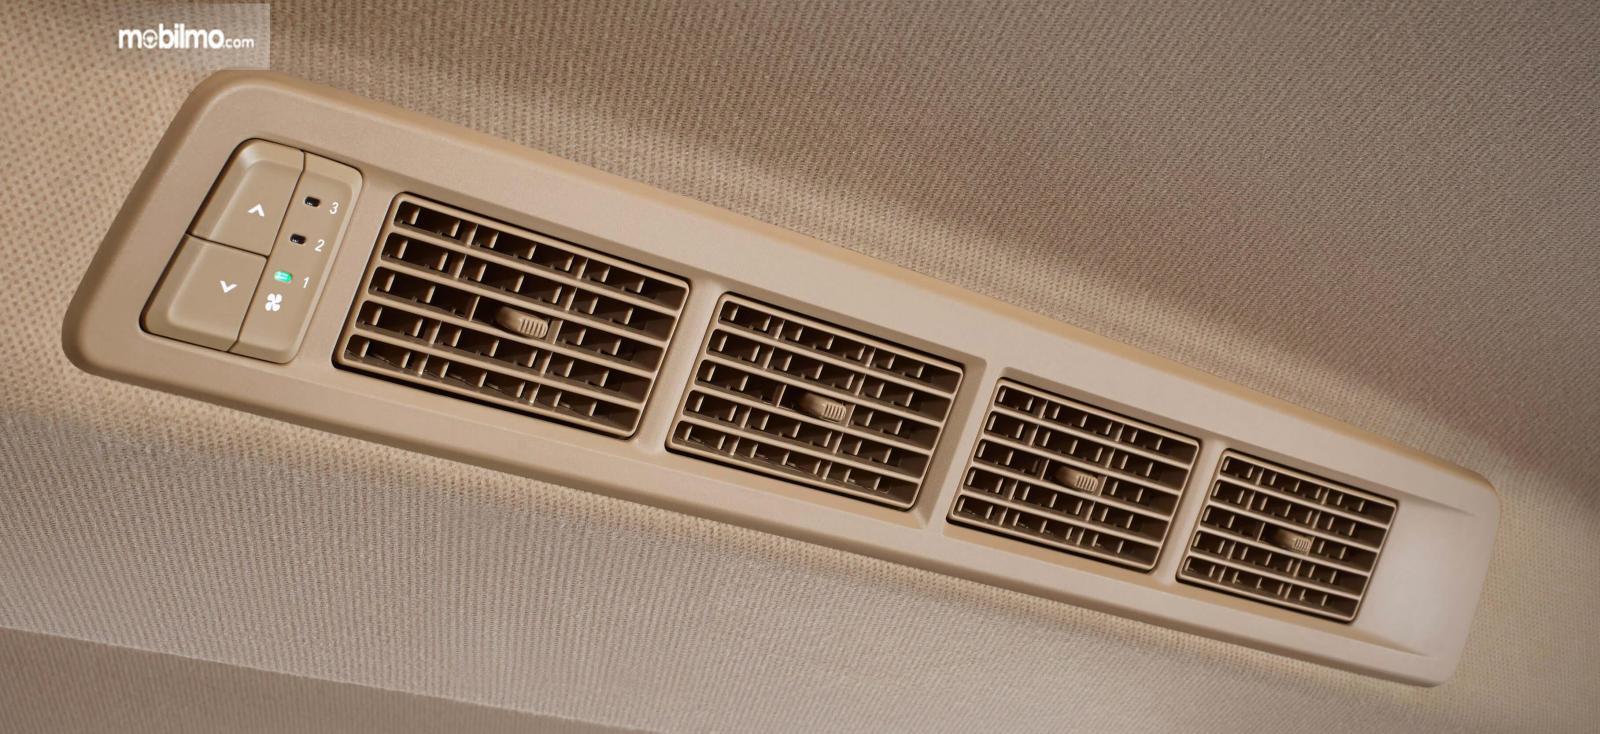 Foto AC double blower Wuling Confero S